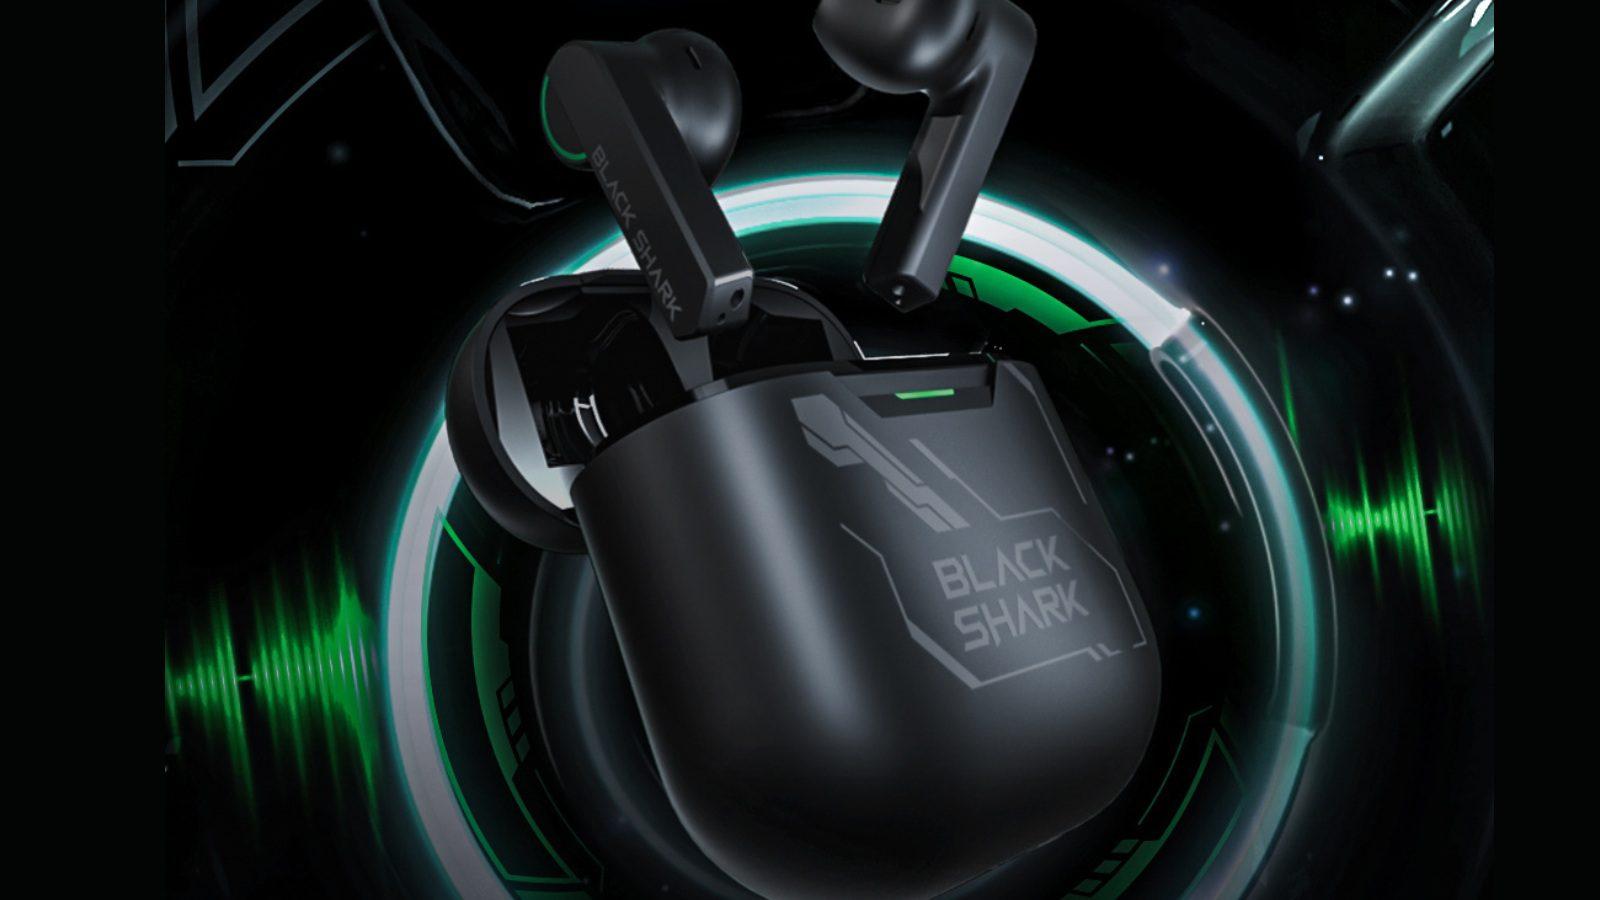 Blackshark Earbuds